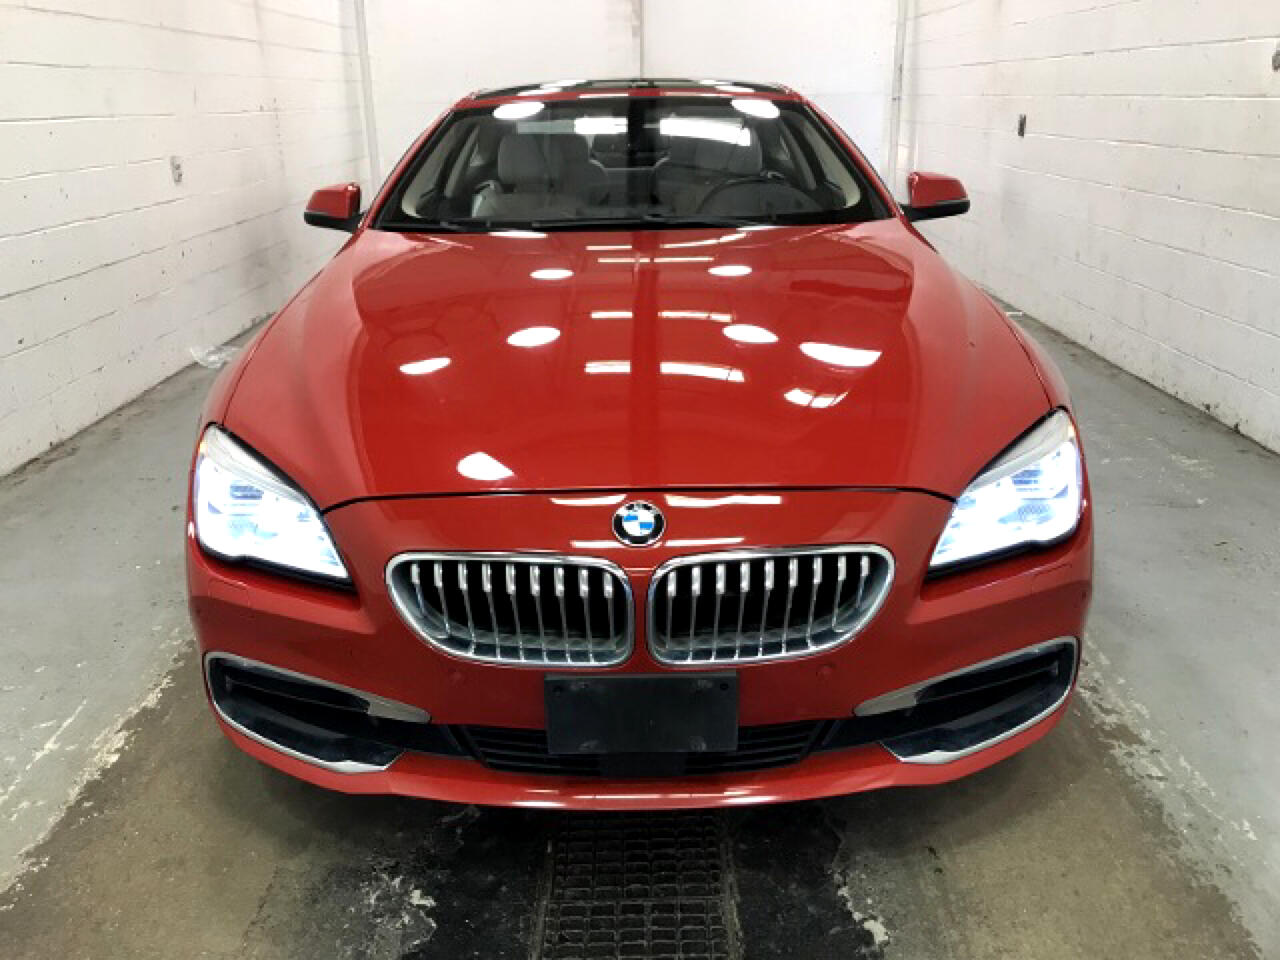 BMW 6 Series 2dr Cpe 650i xDrive AWD 2016